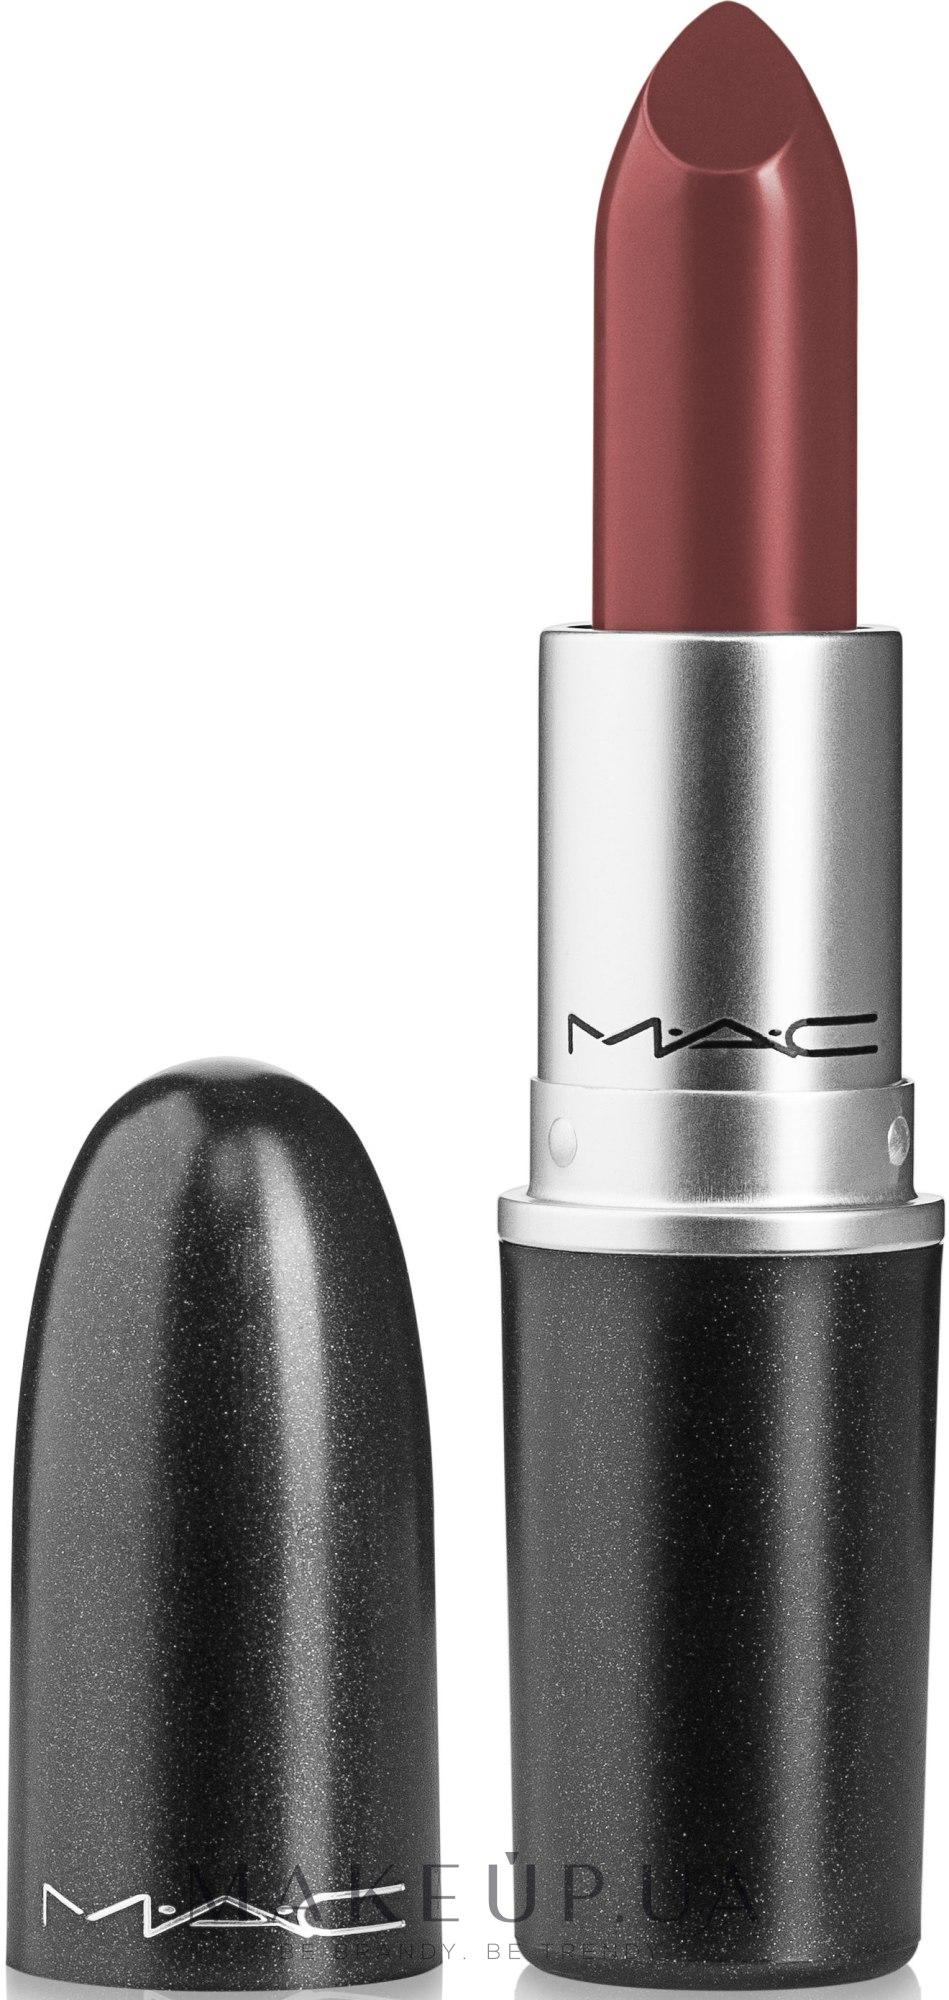 Губная помада - M.A.C Matte Lipstick — фото Silver Spoon